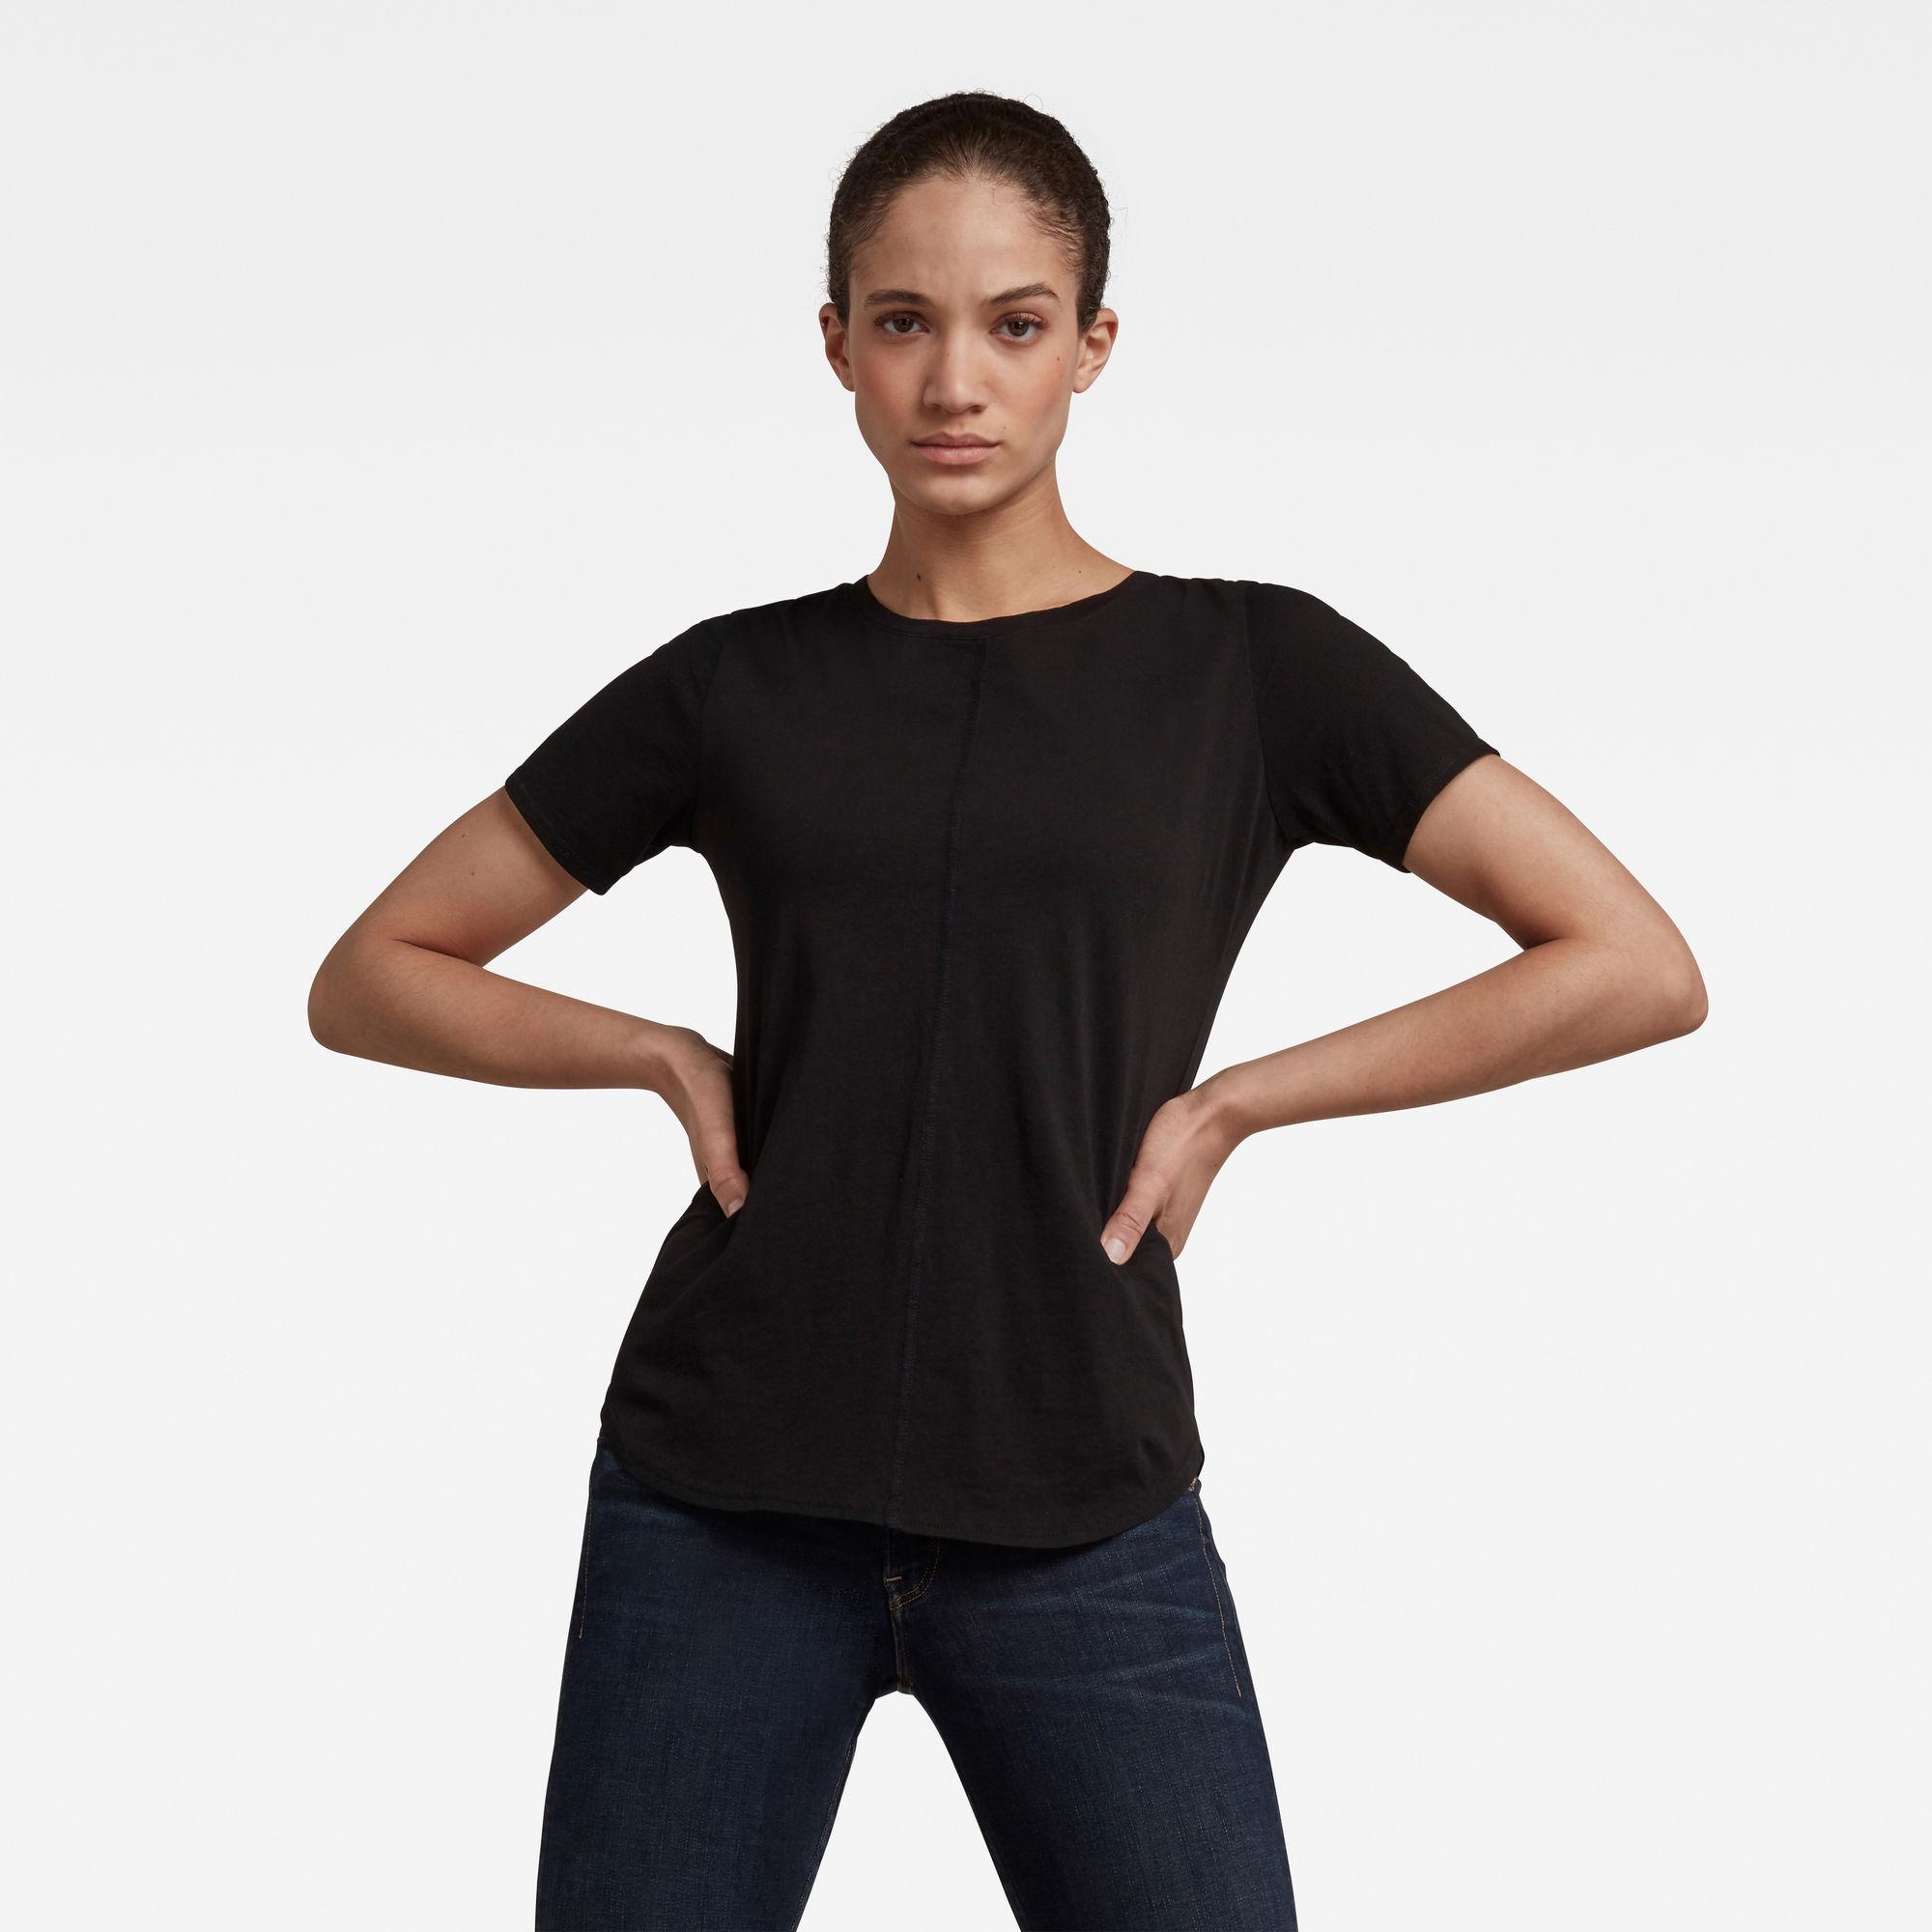 G-Star RAW Dames Adjustable Back Slim Fit Tee Zwart